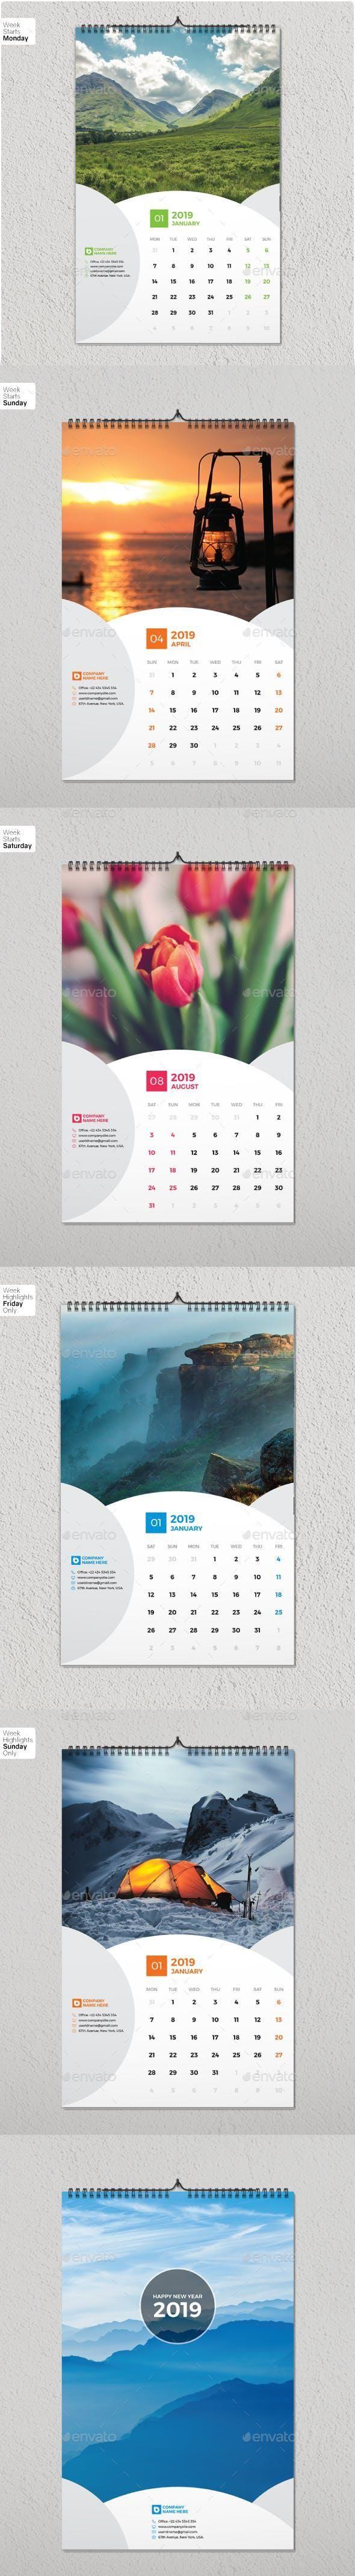 Wall Calendar 2019 #stationeryshop #printtemplates intended for Cvs Desk Calendar